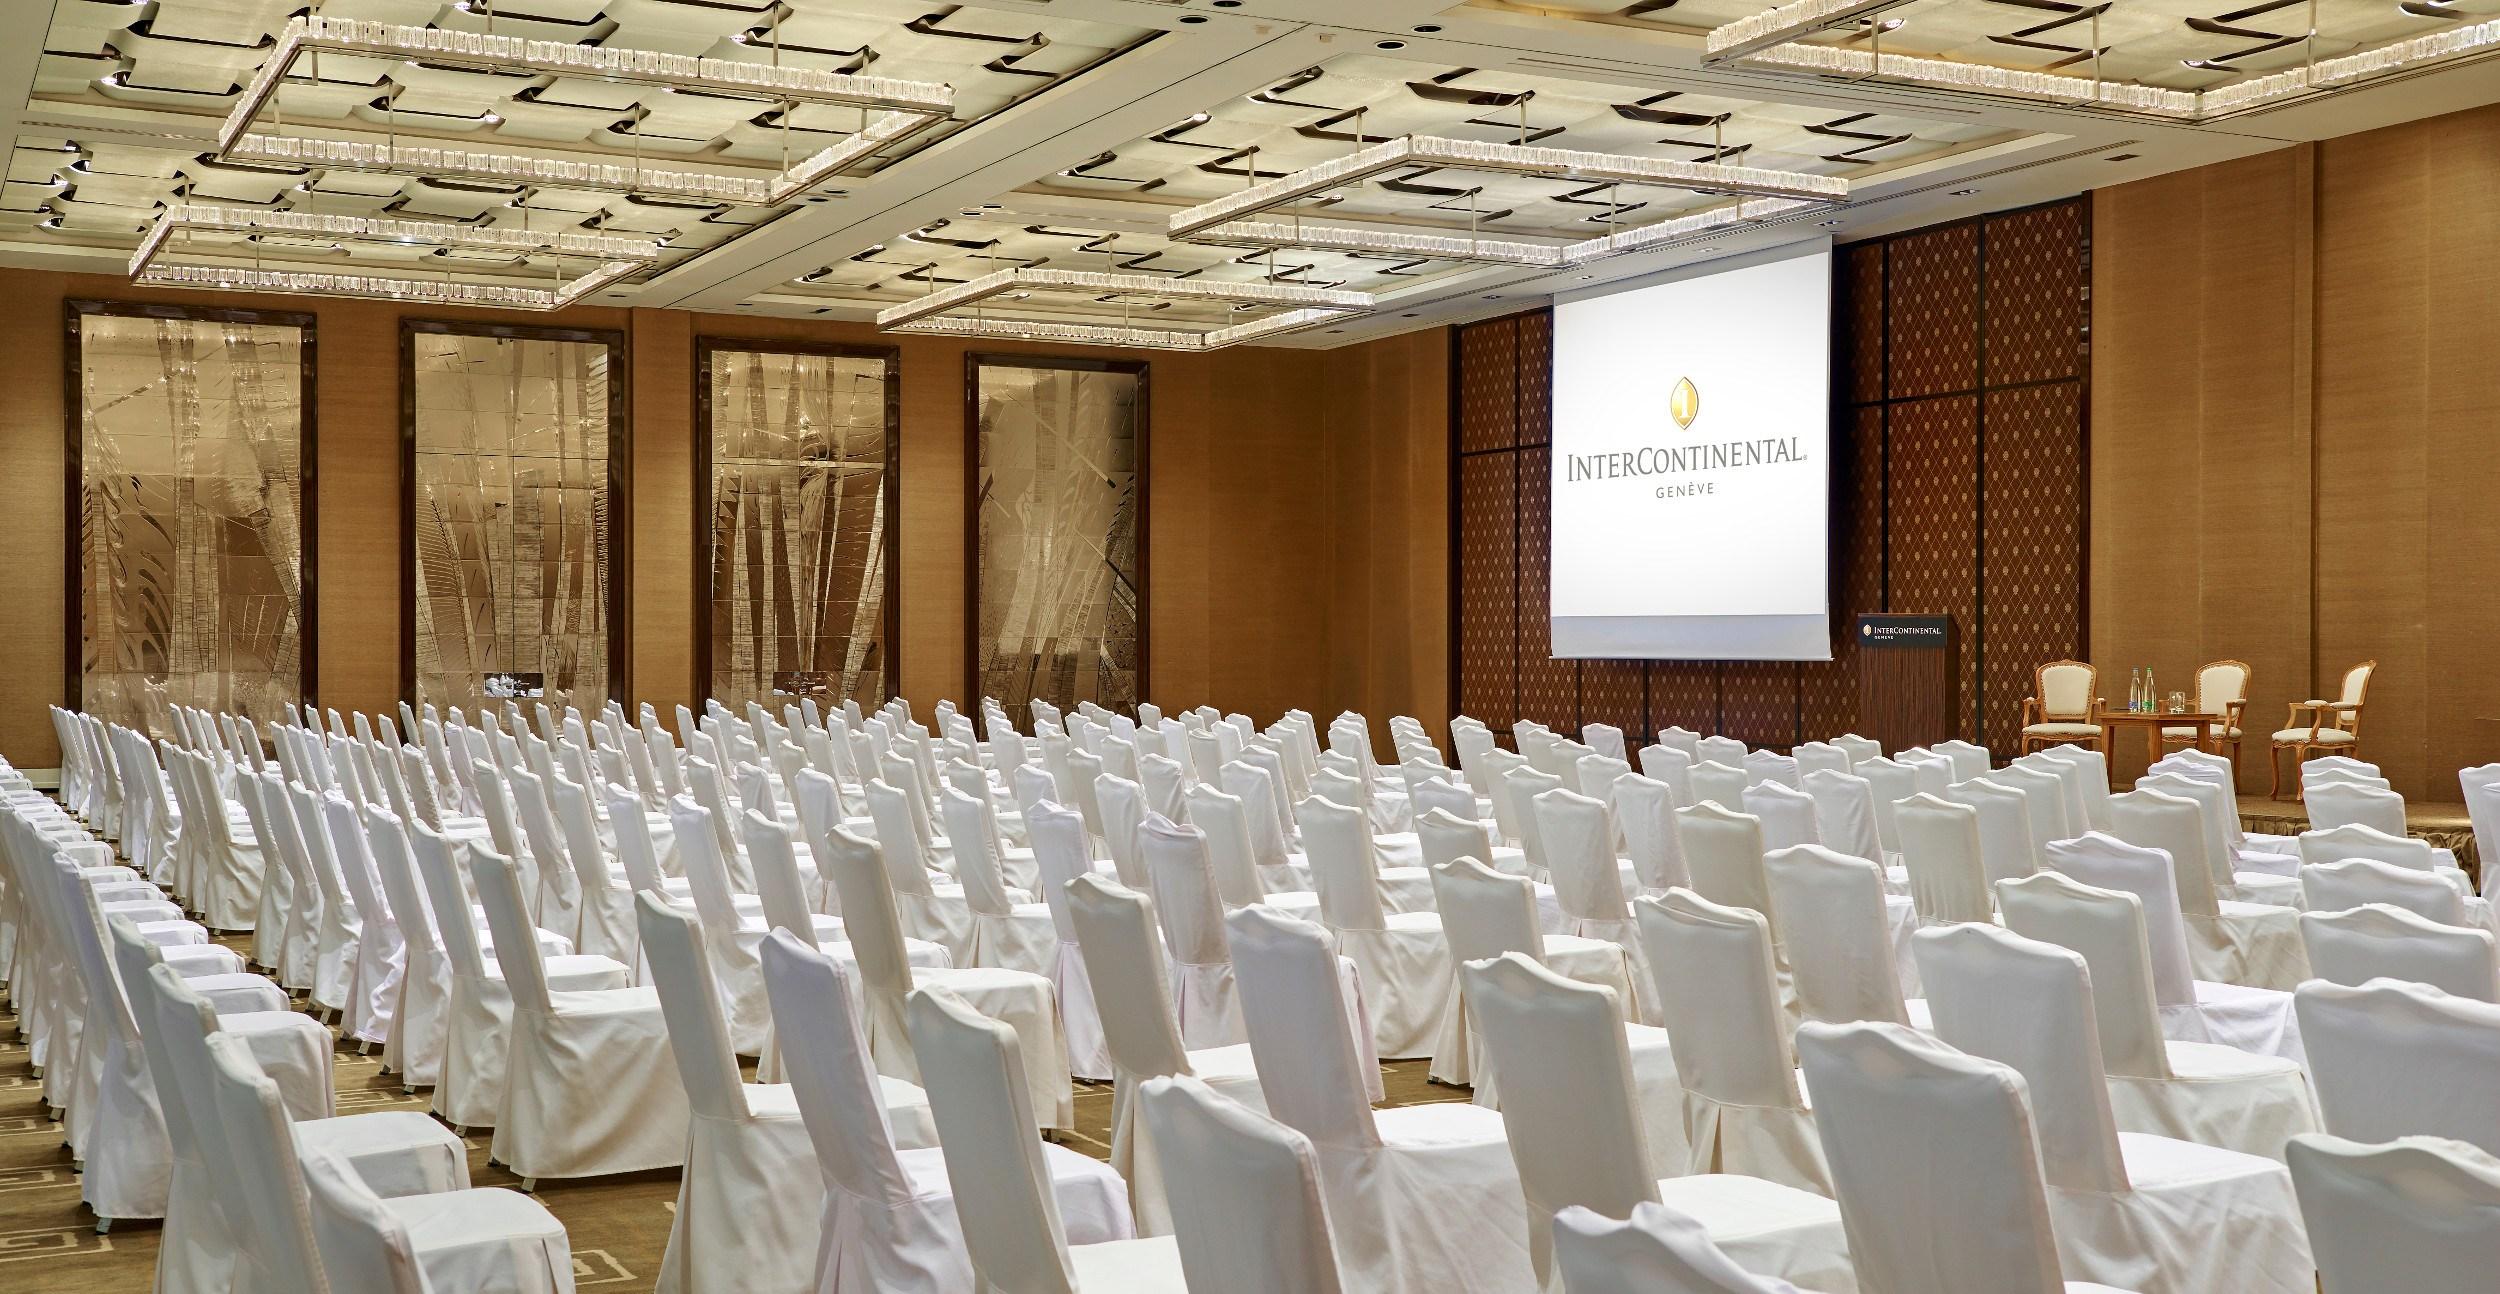 InterContinental-Geneva-Hotel-Meeting-Conference